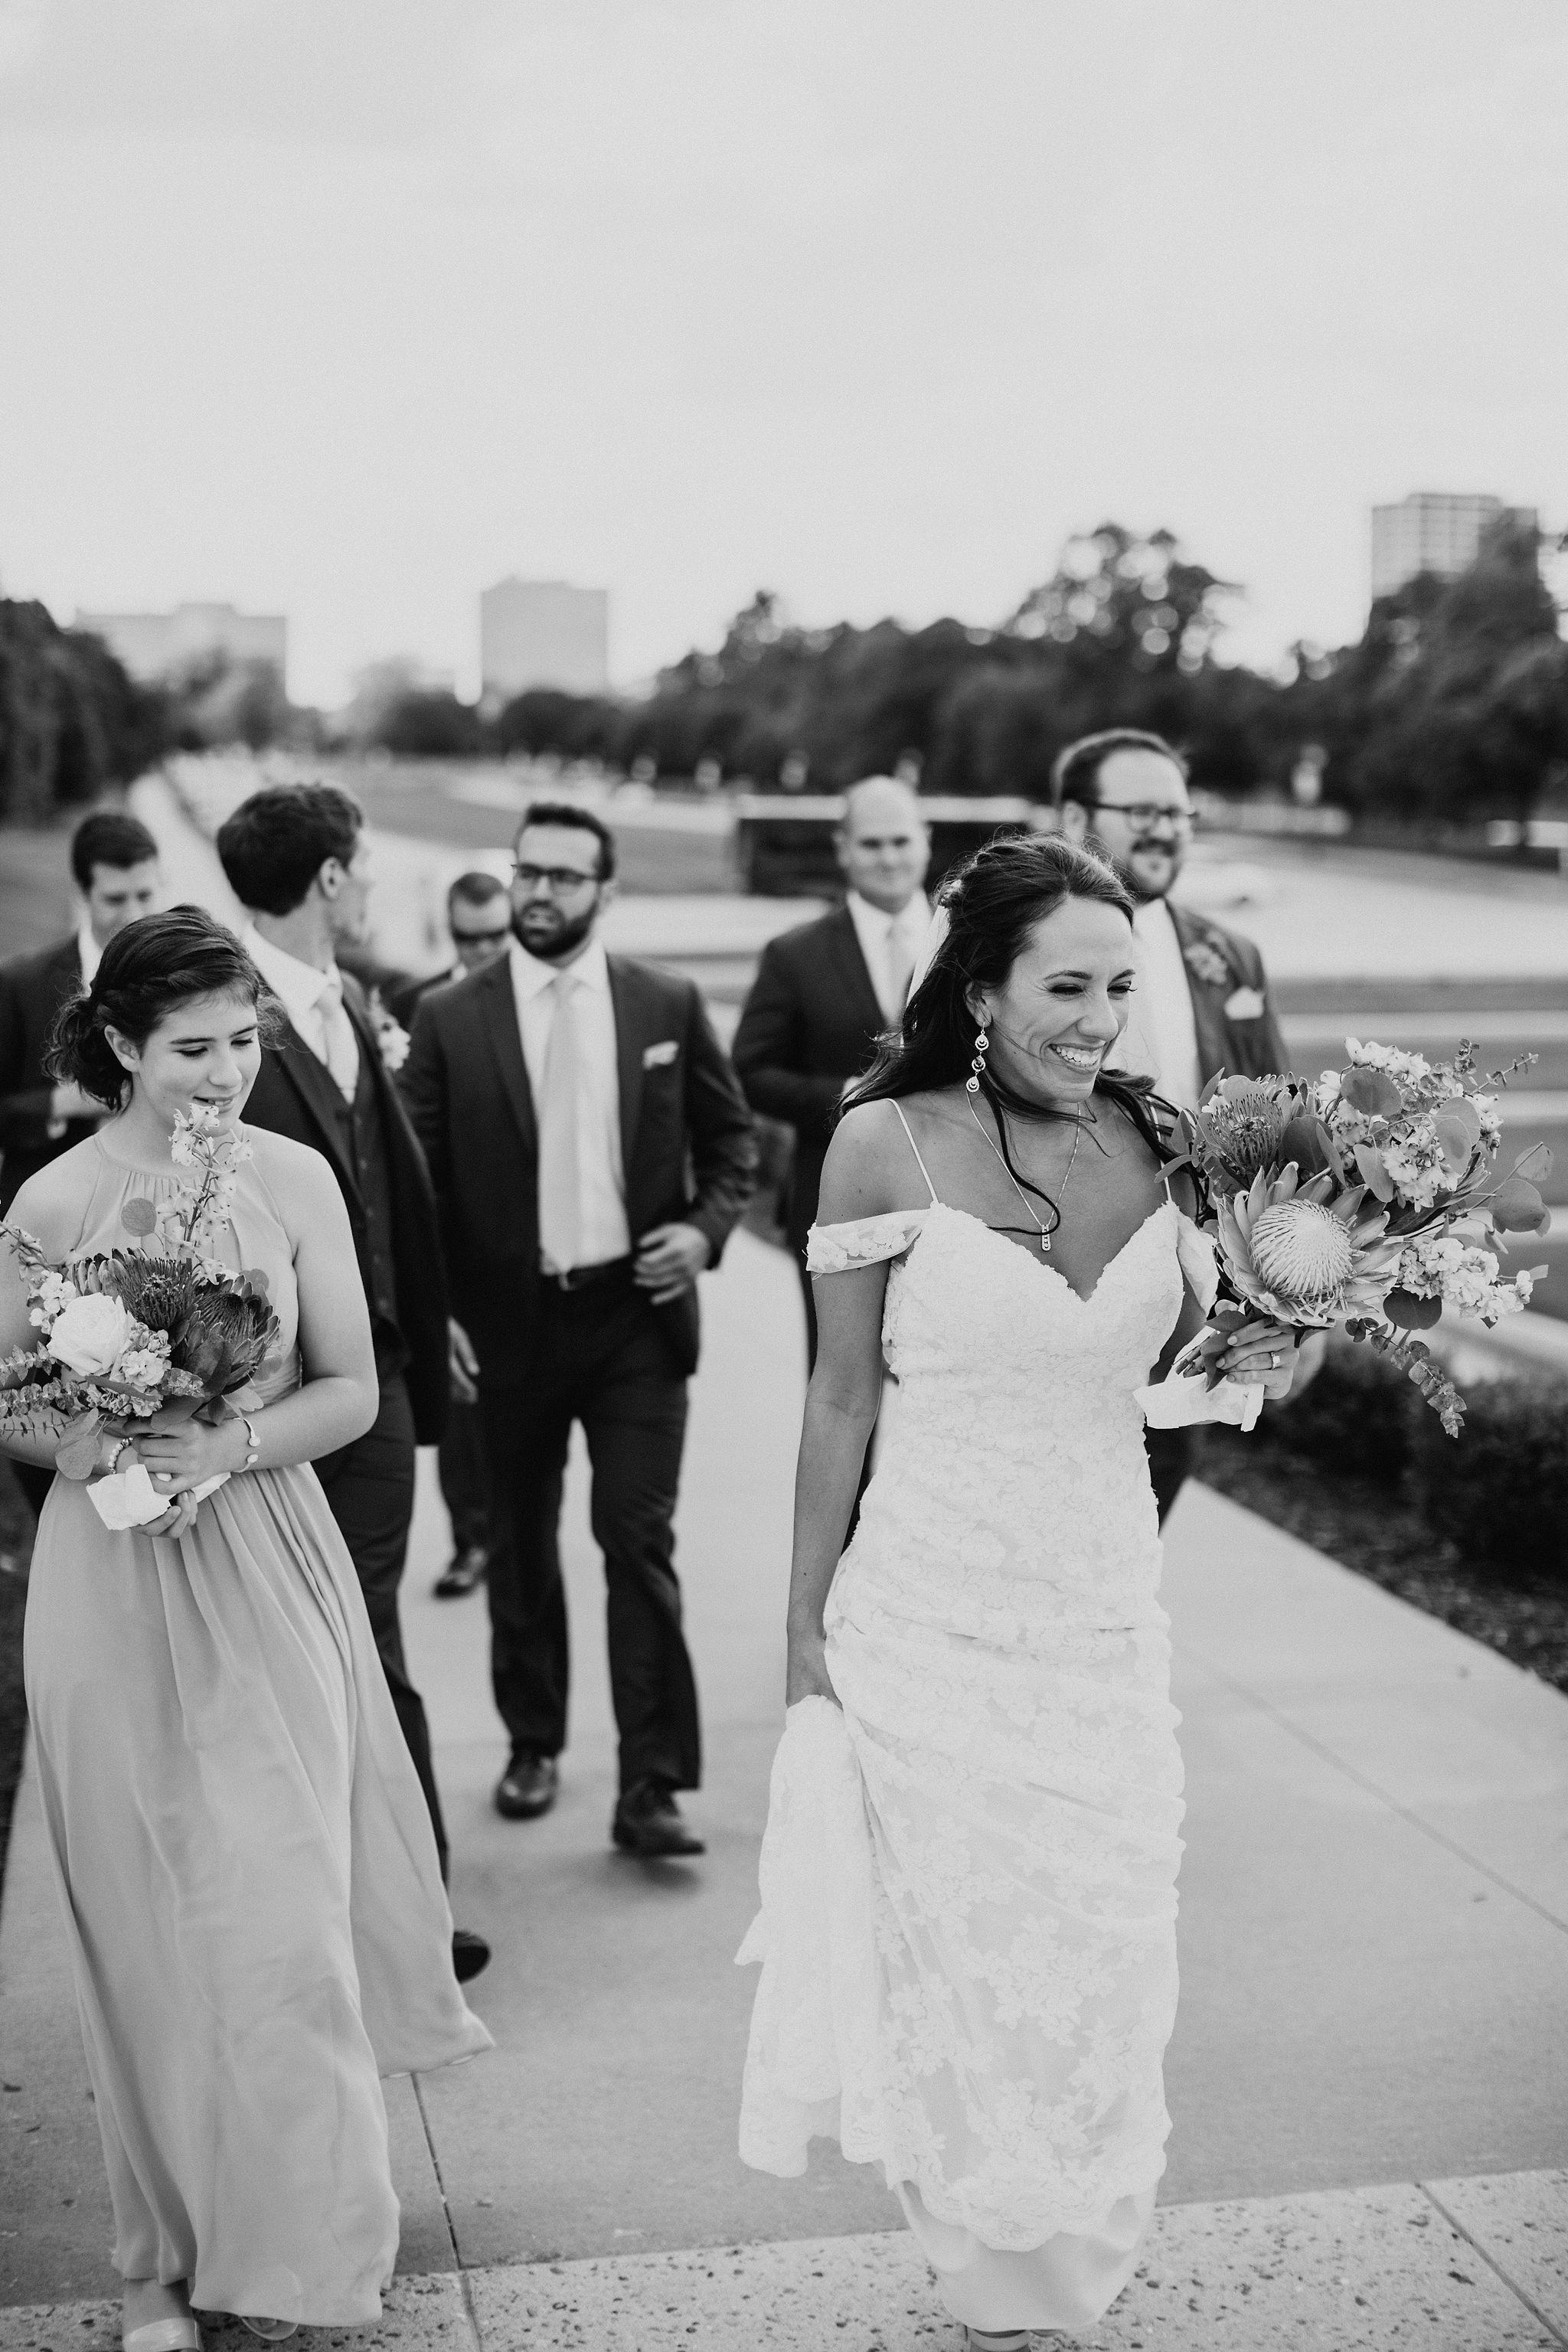 Cure of Ars and Twenty Three Event Space Station Room Wedding_Cinder Block Brewery Wedding_Kindling Wedding Photography_06.JPG